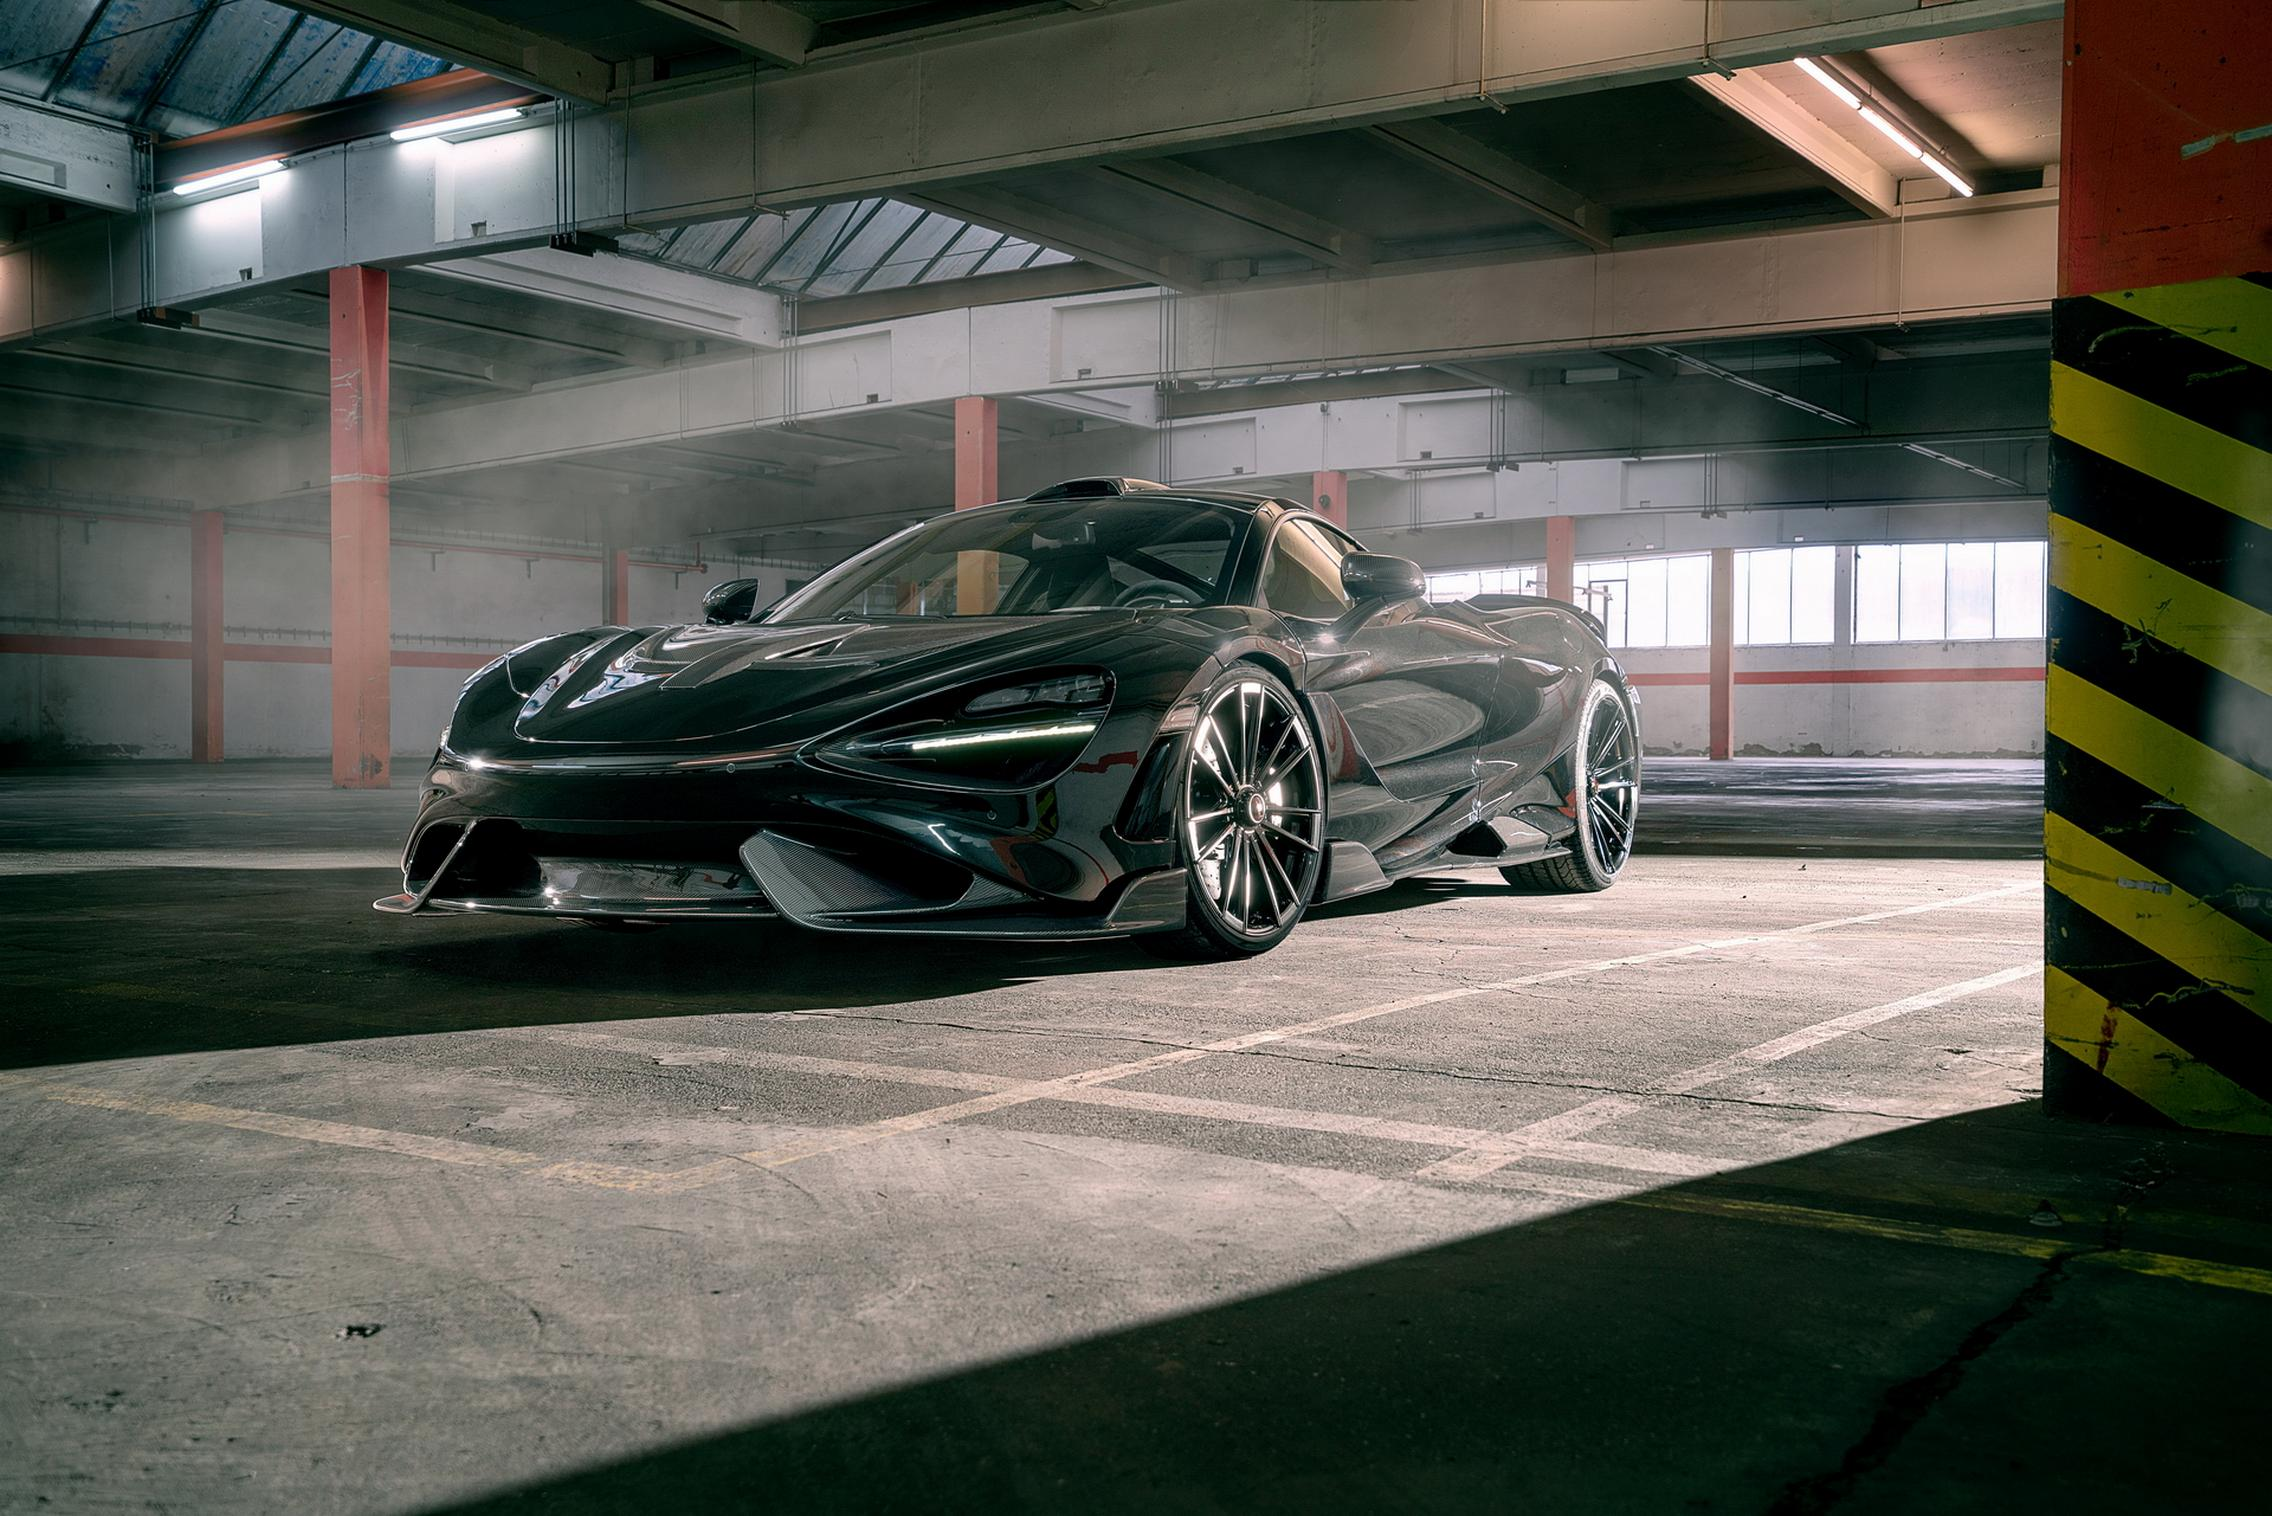 Black Novitec McLaren 765LT